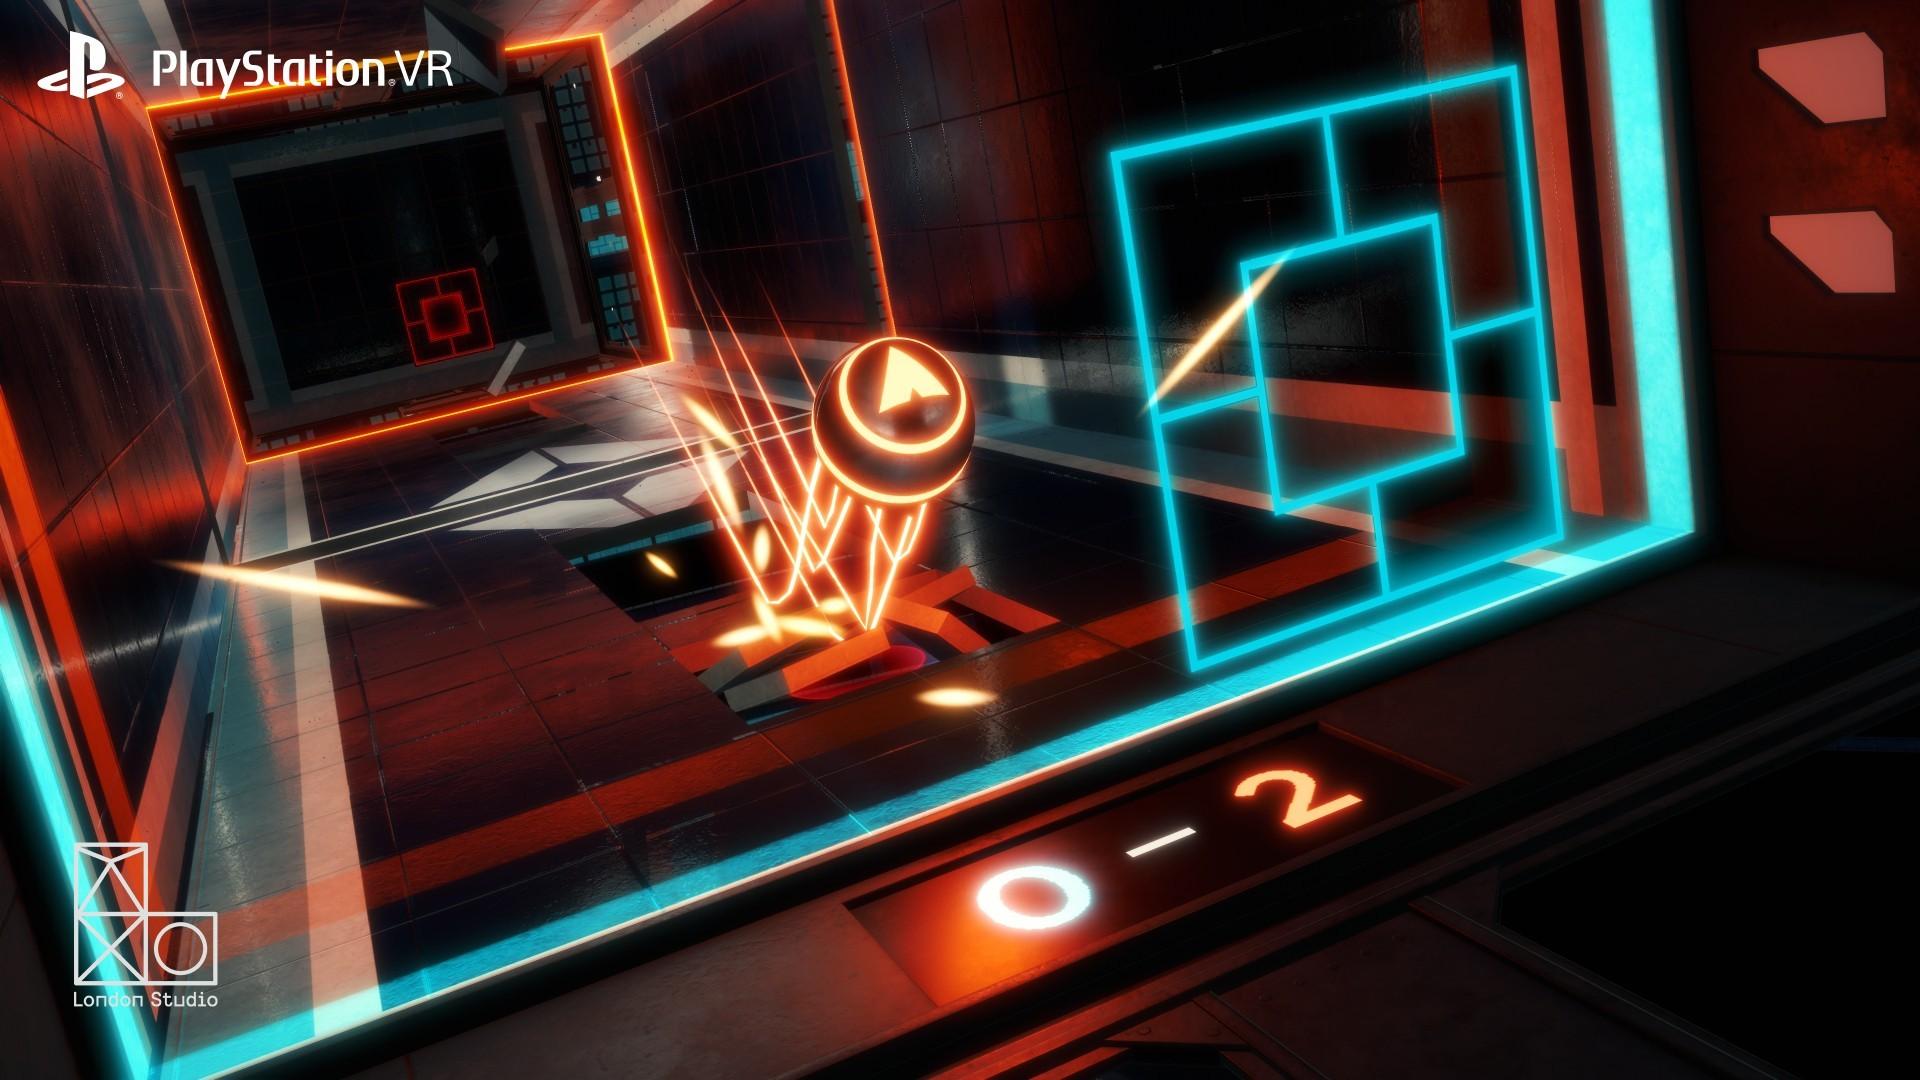 《PS VR世界》IGN评分6.0